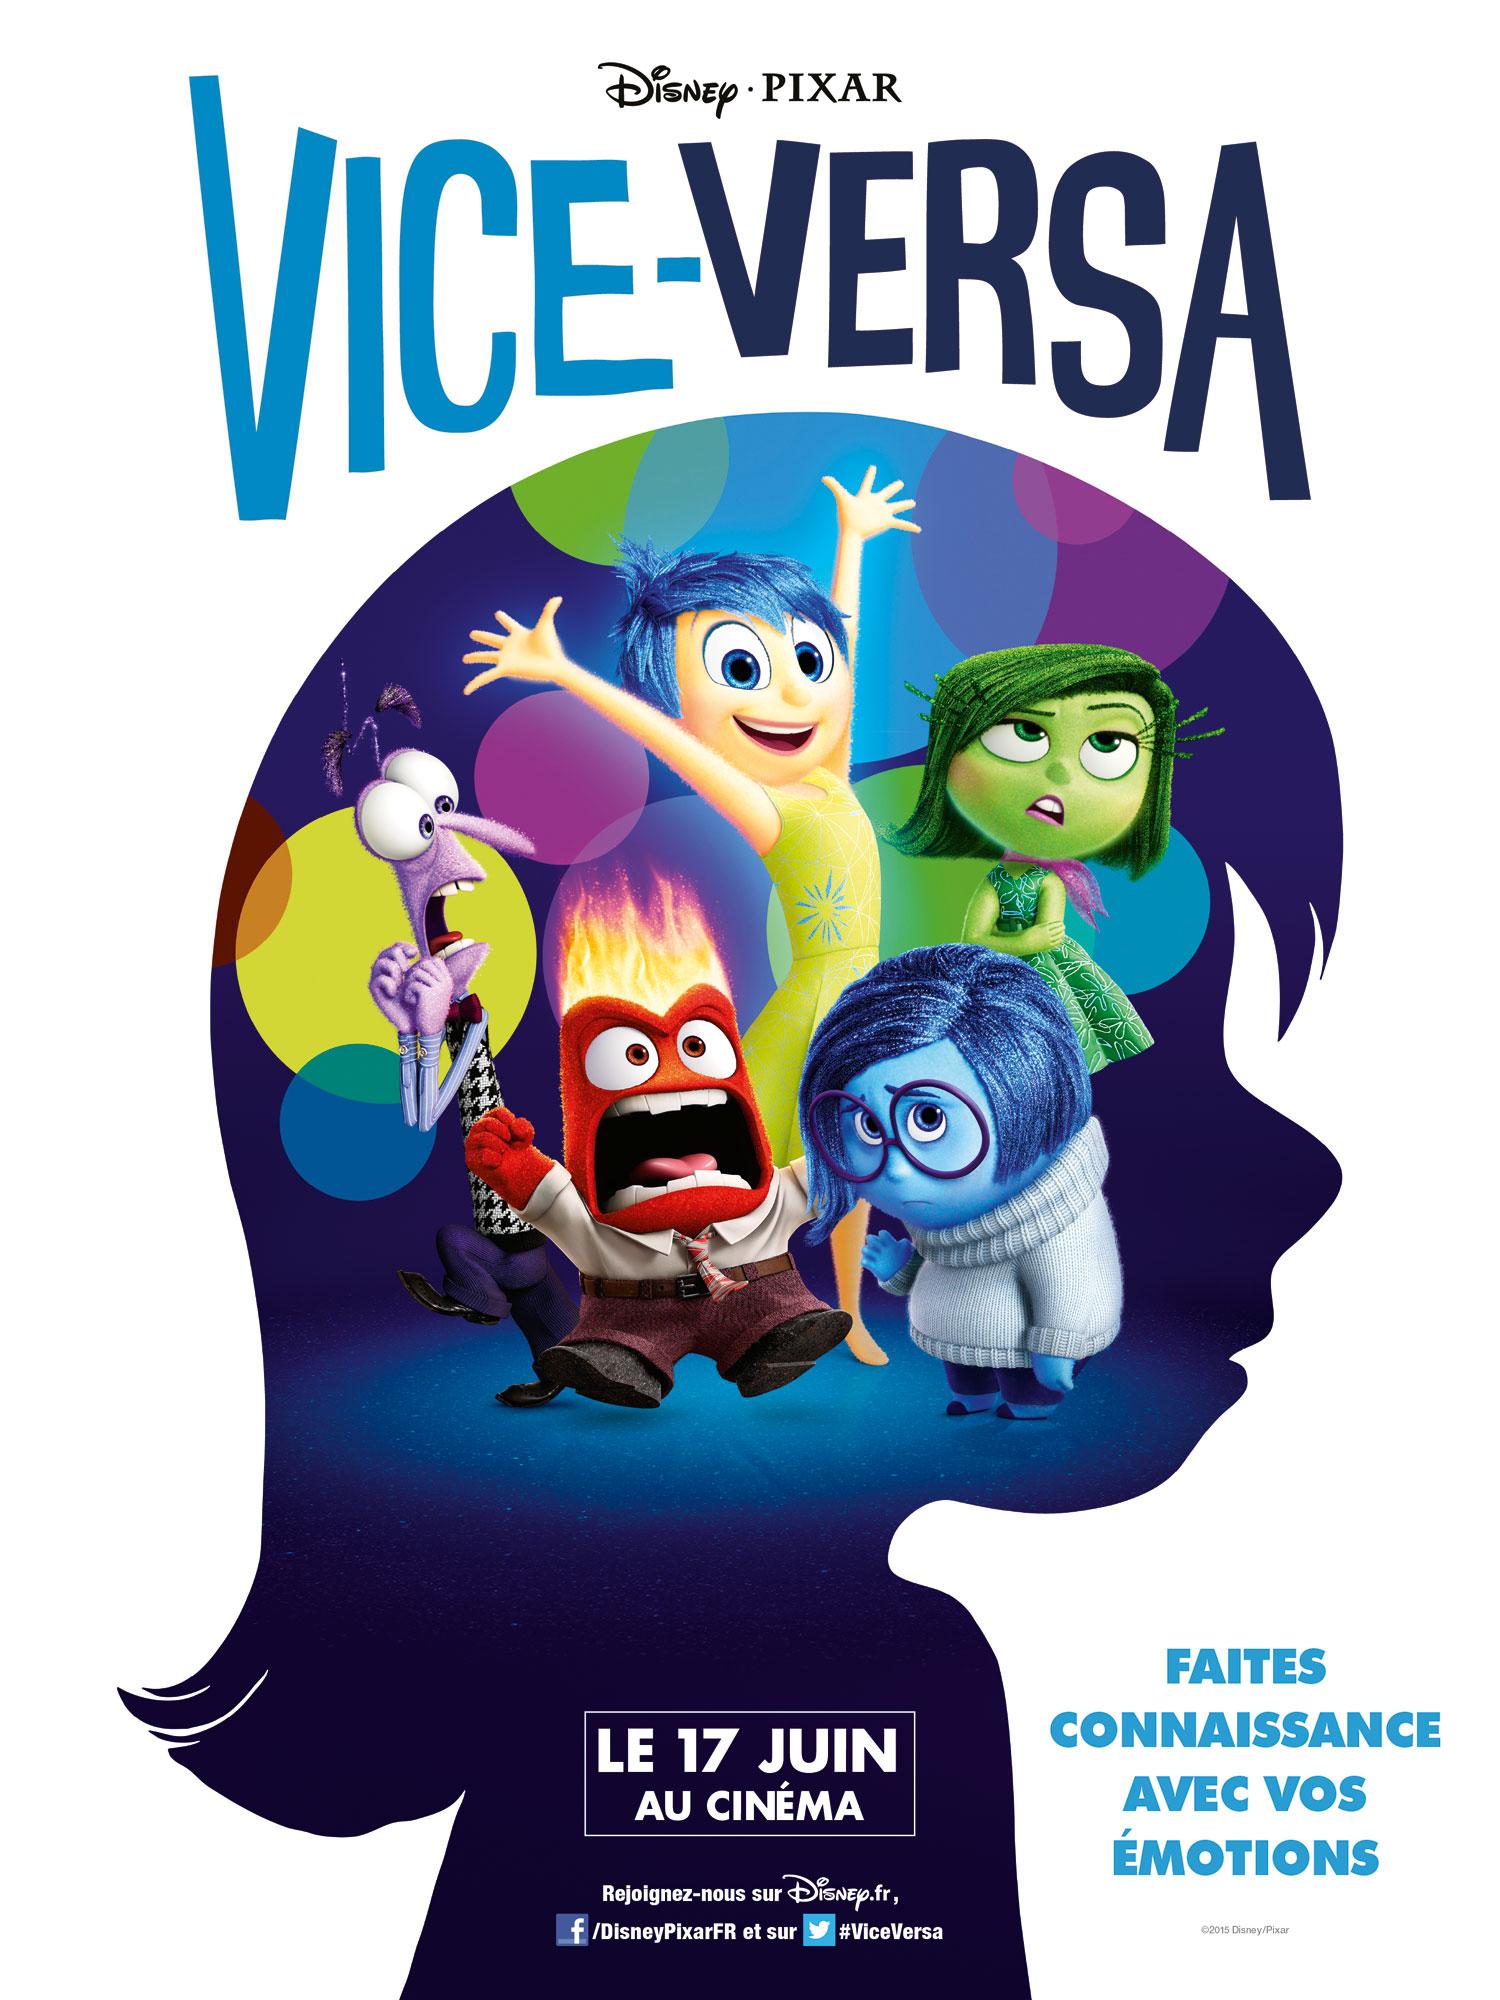 vice-versa affiche poster inside out pixar disney